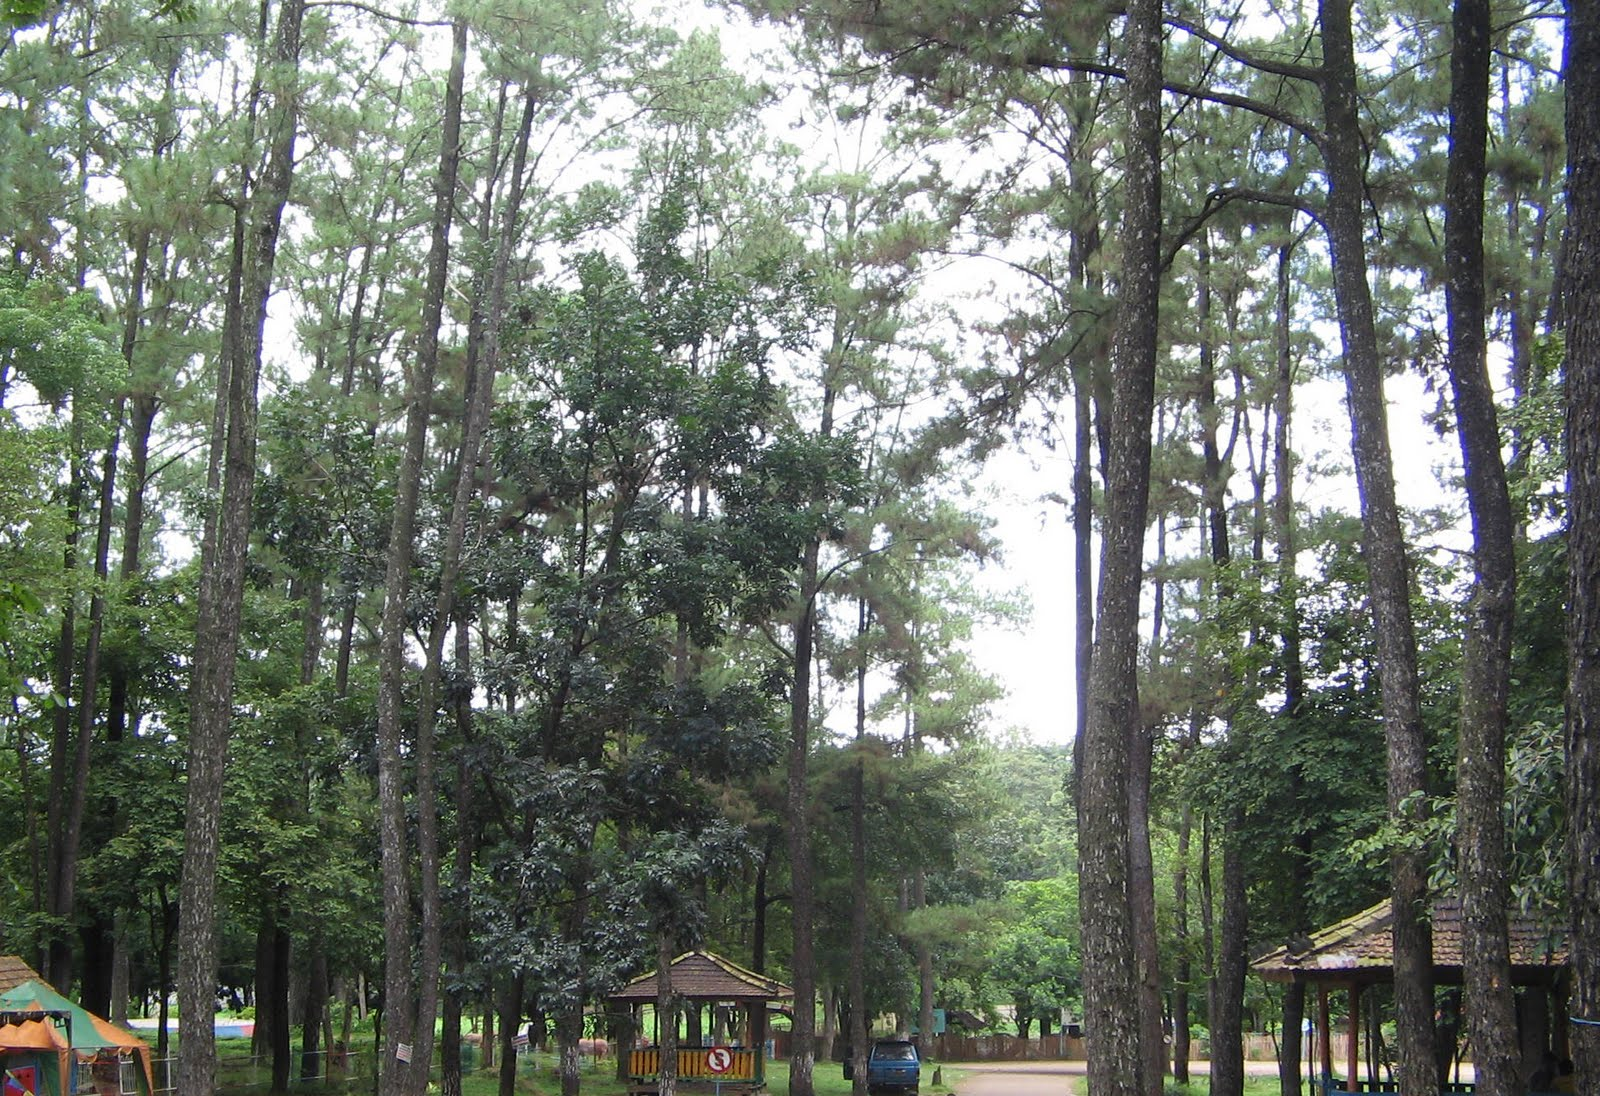 Majalah Dahsyat Palembang Pemkot Ambil Alih Hutan Wisata Punti Kayu